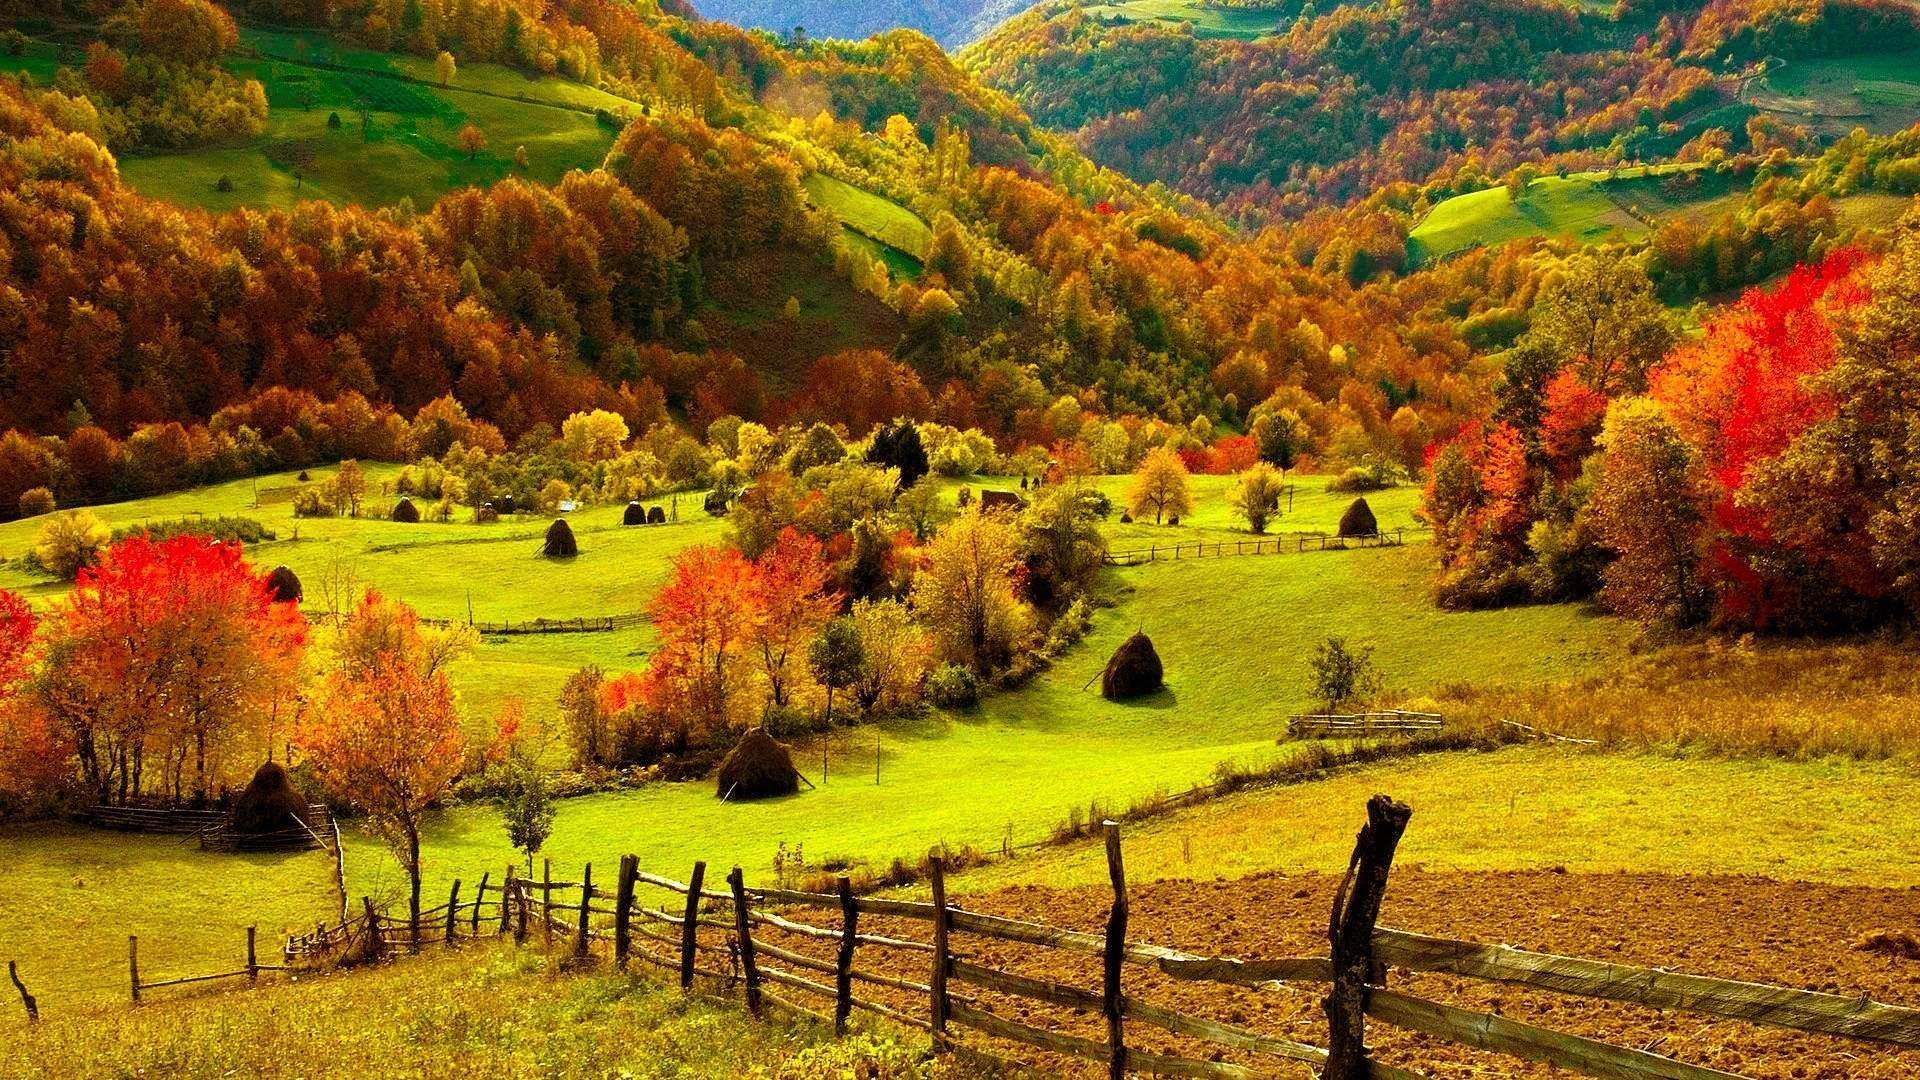 pix for fall scenery desktop backgrounds